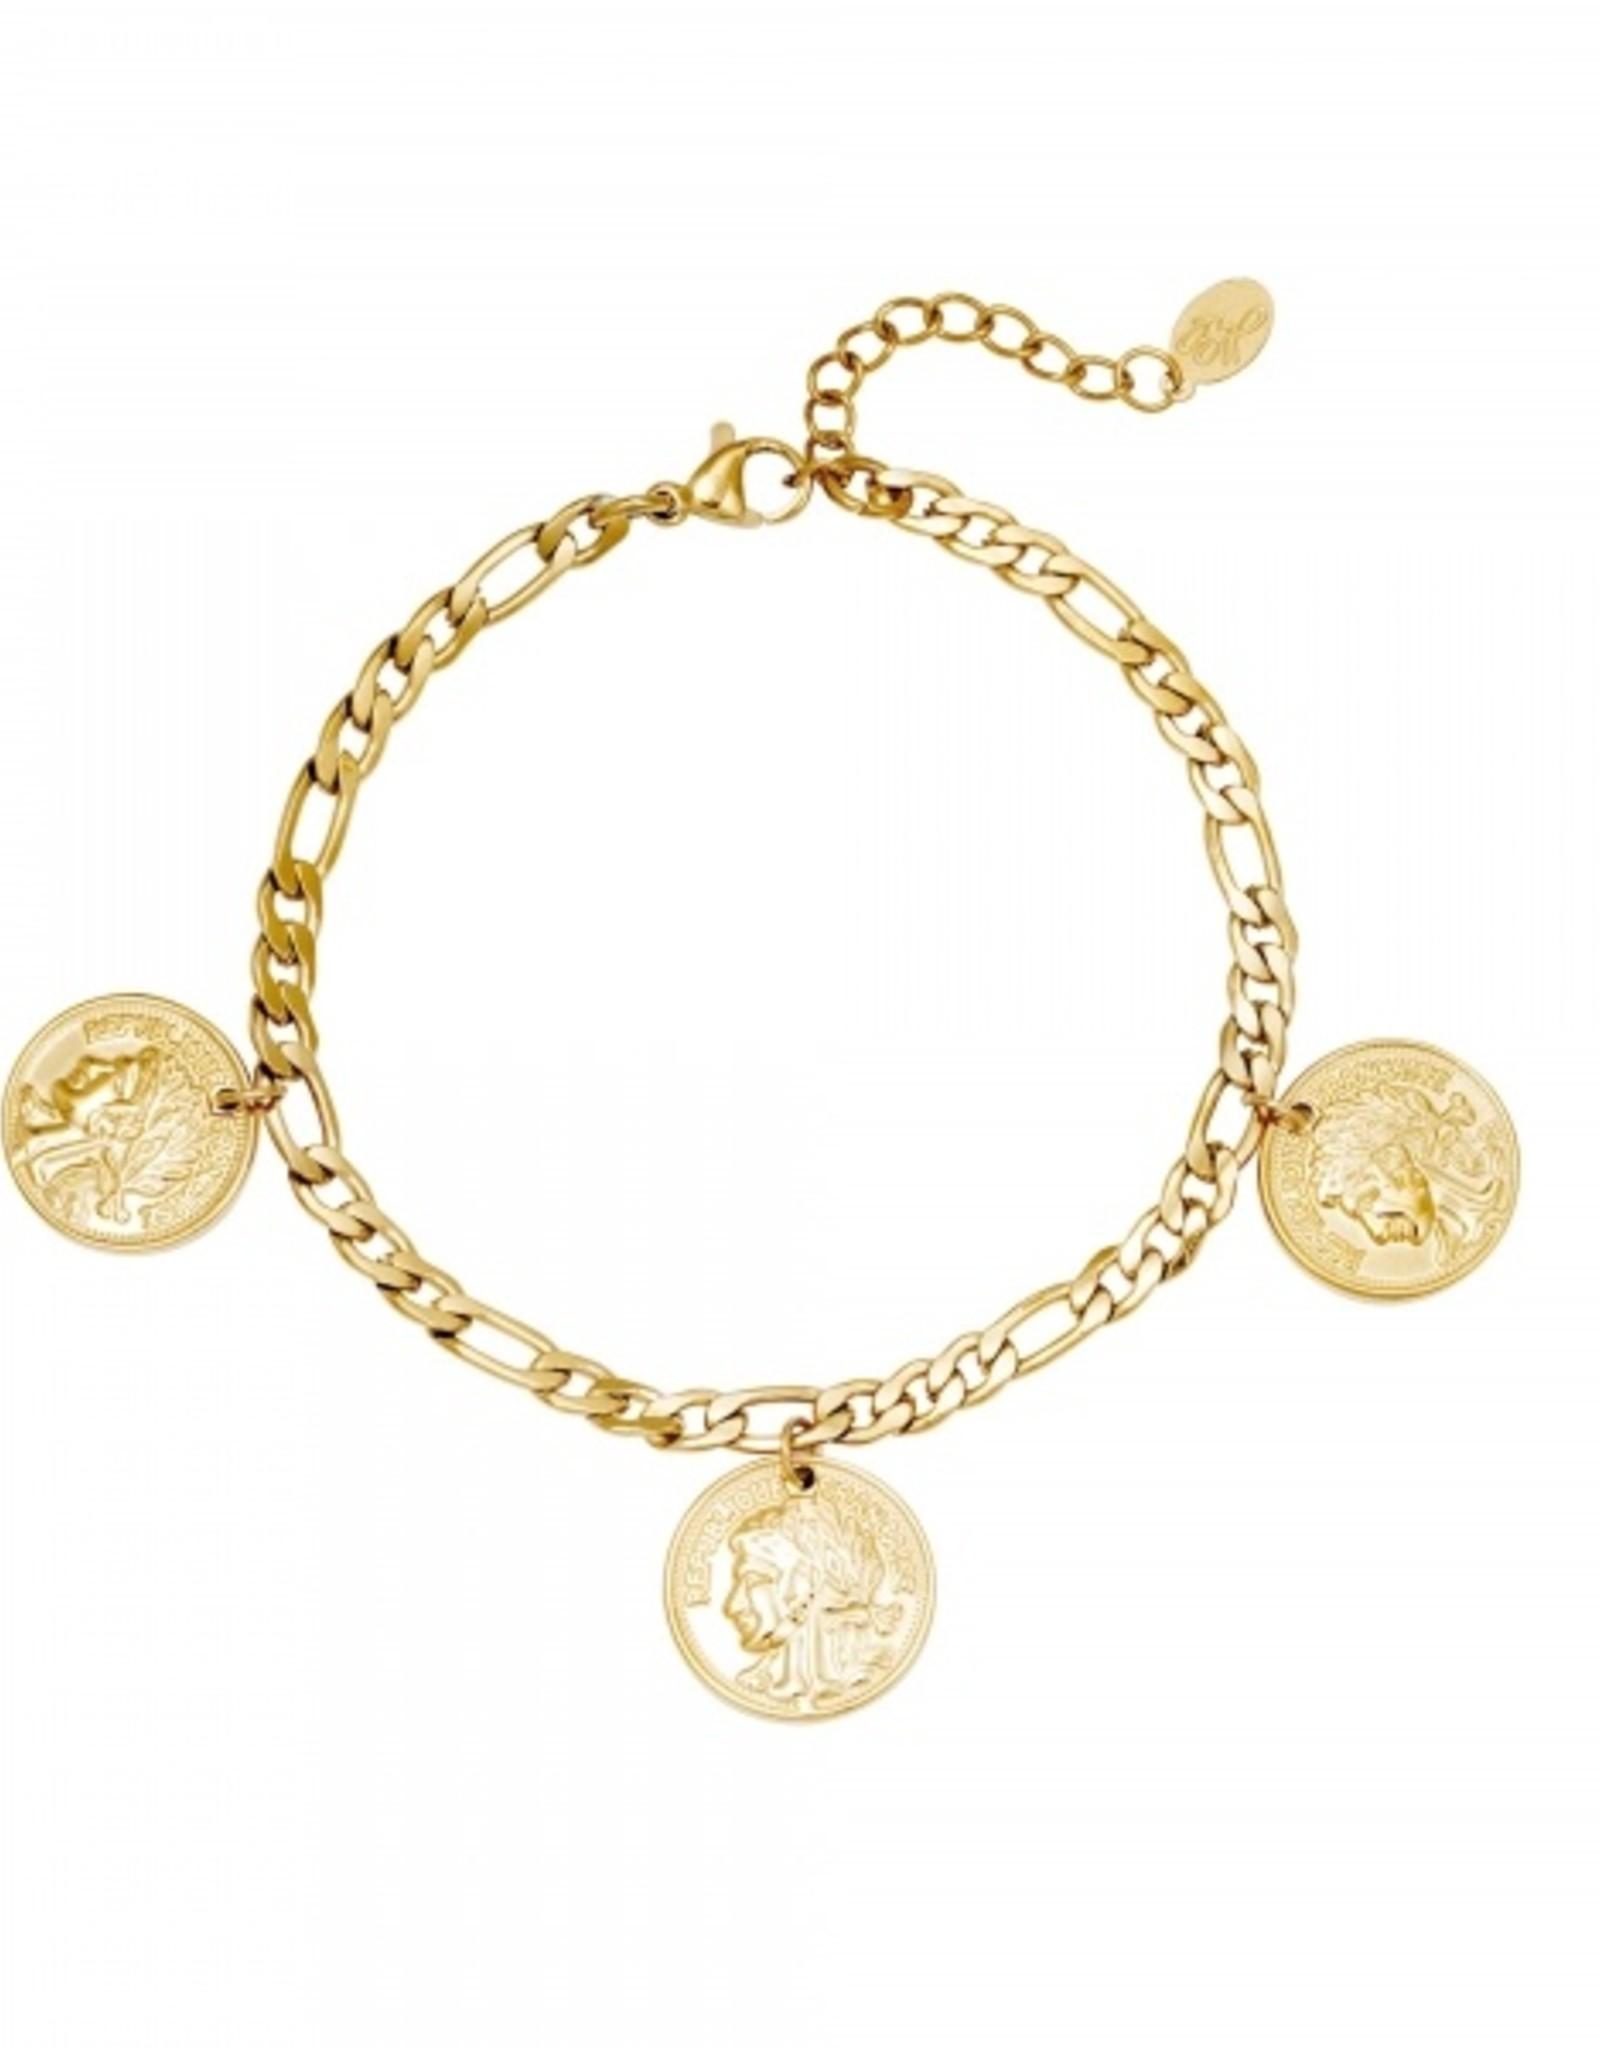 Bracelet ancient coinage gold